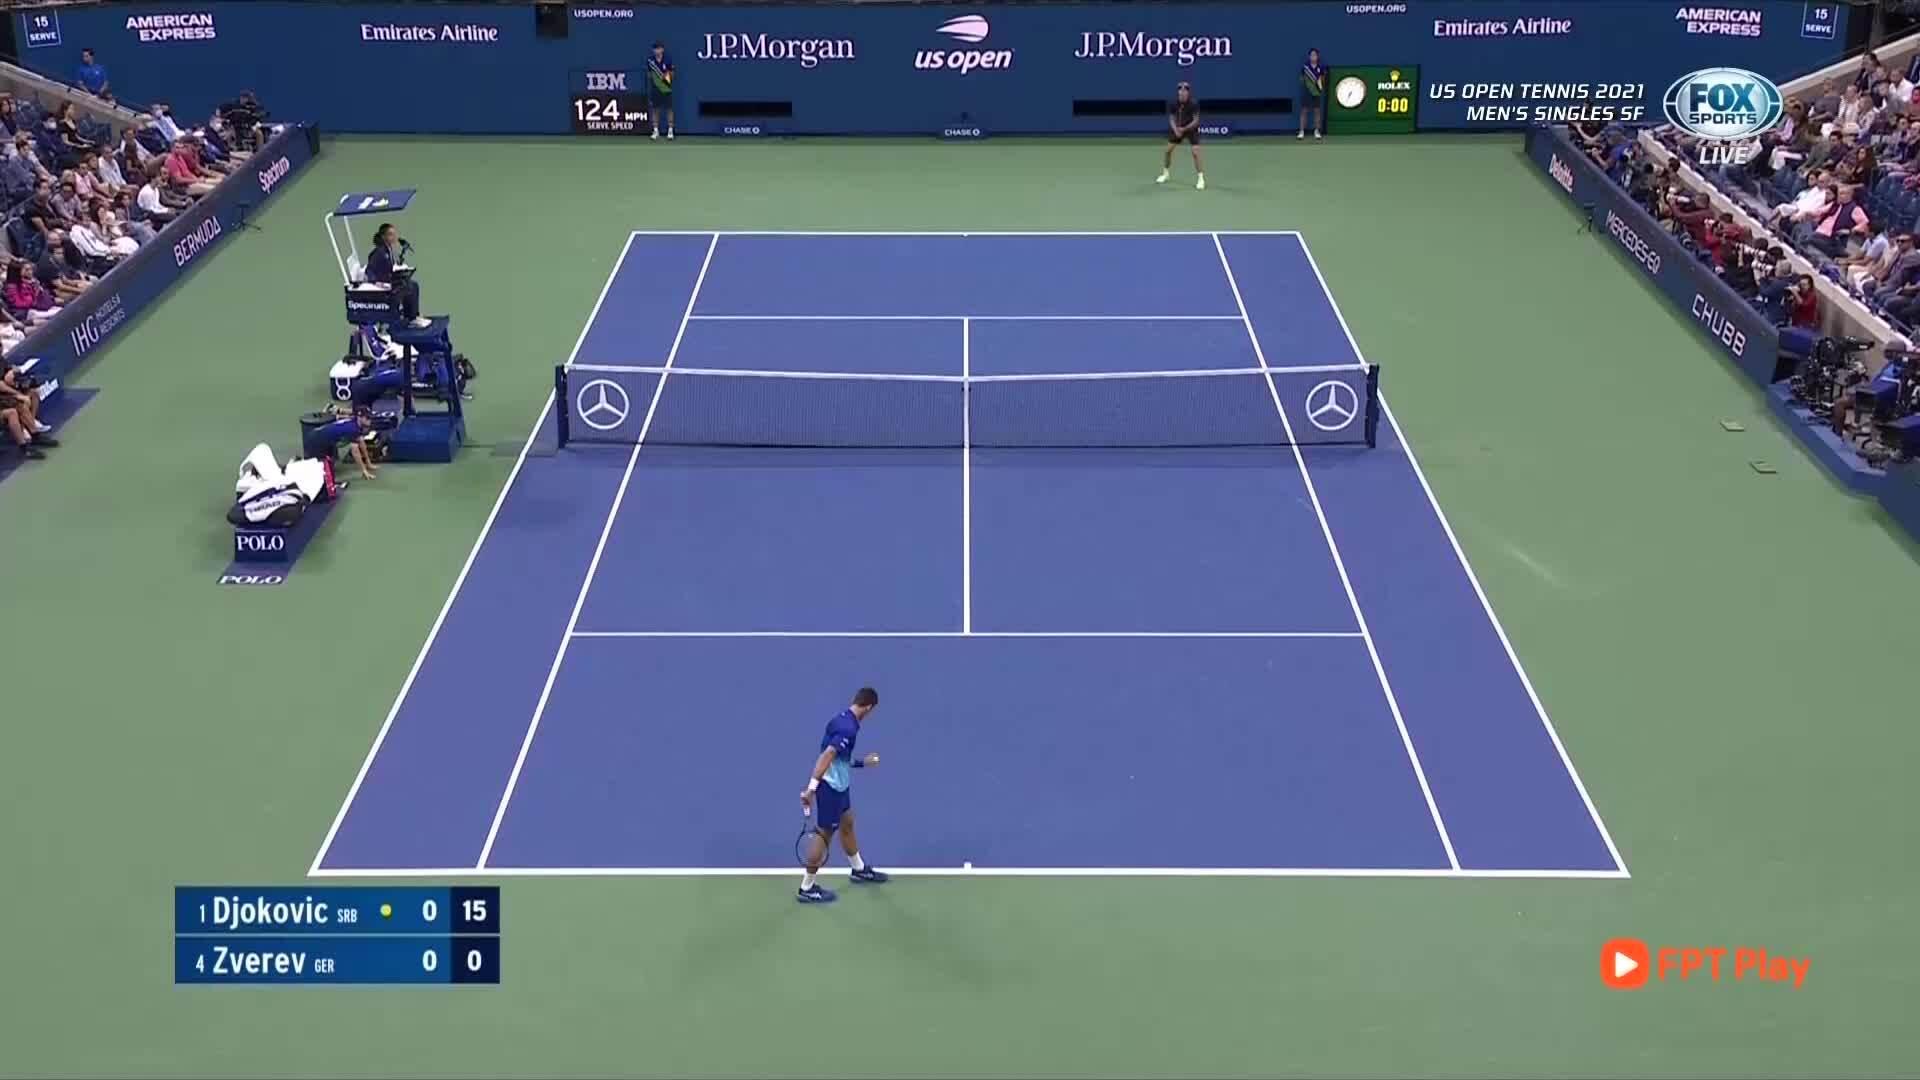 2-1 cho Djokovic